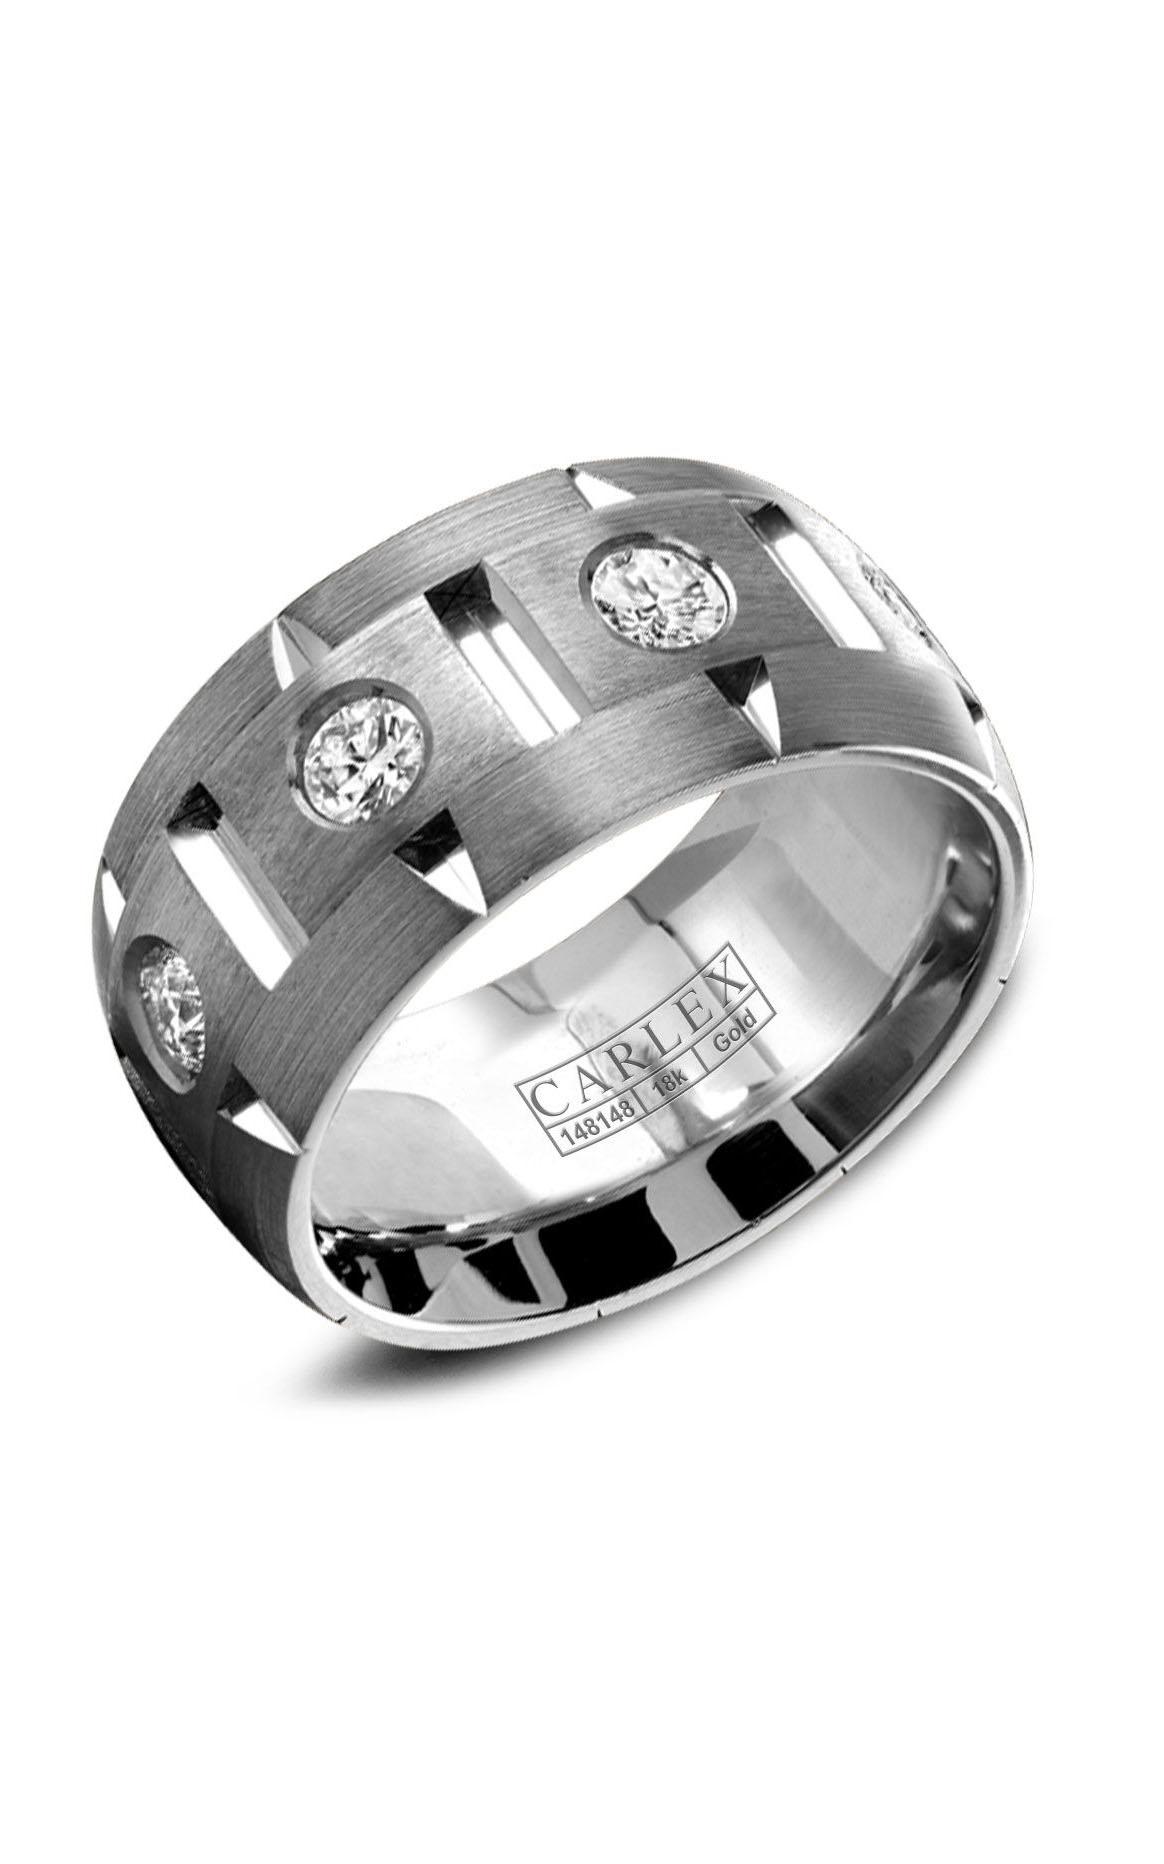 Carlex G1 WB-9483 product image